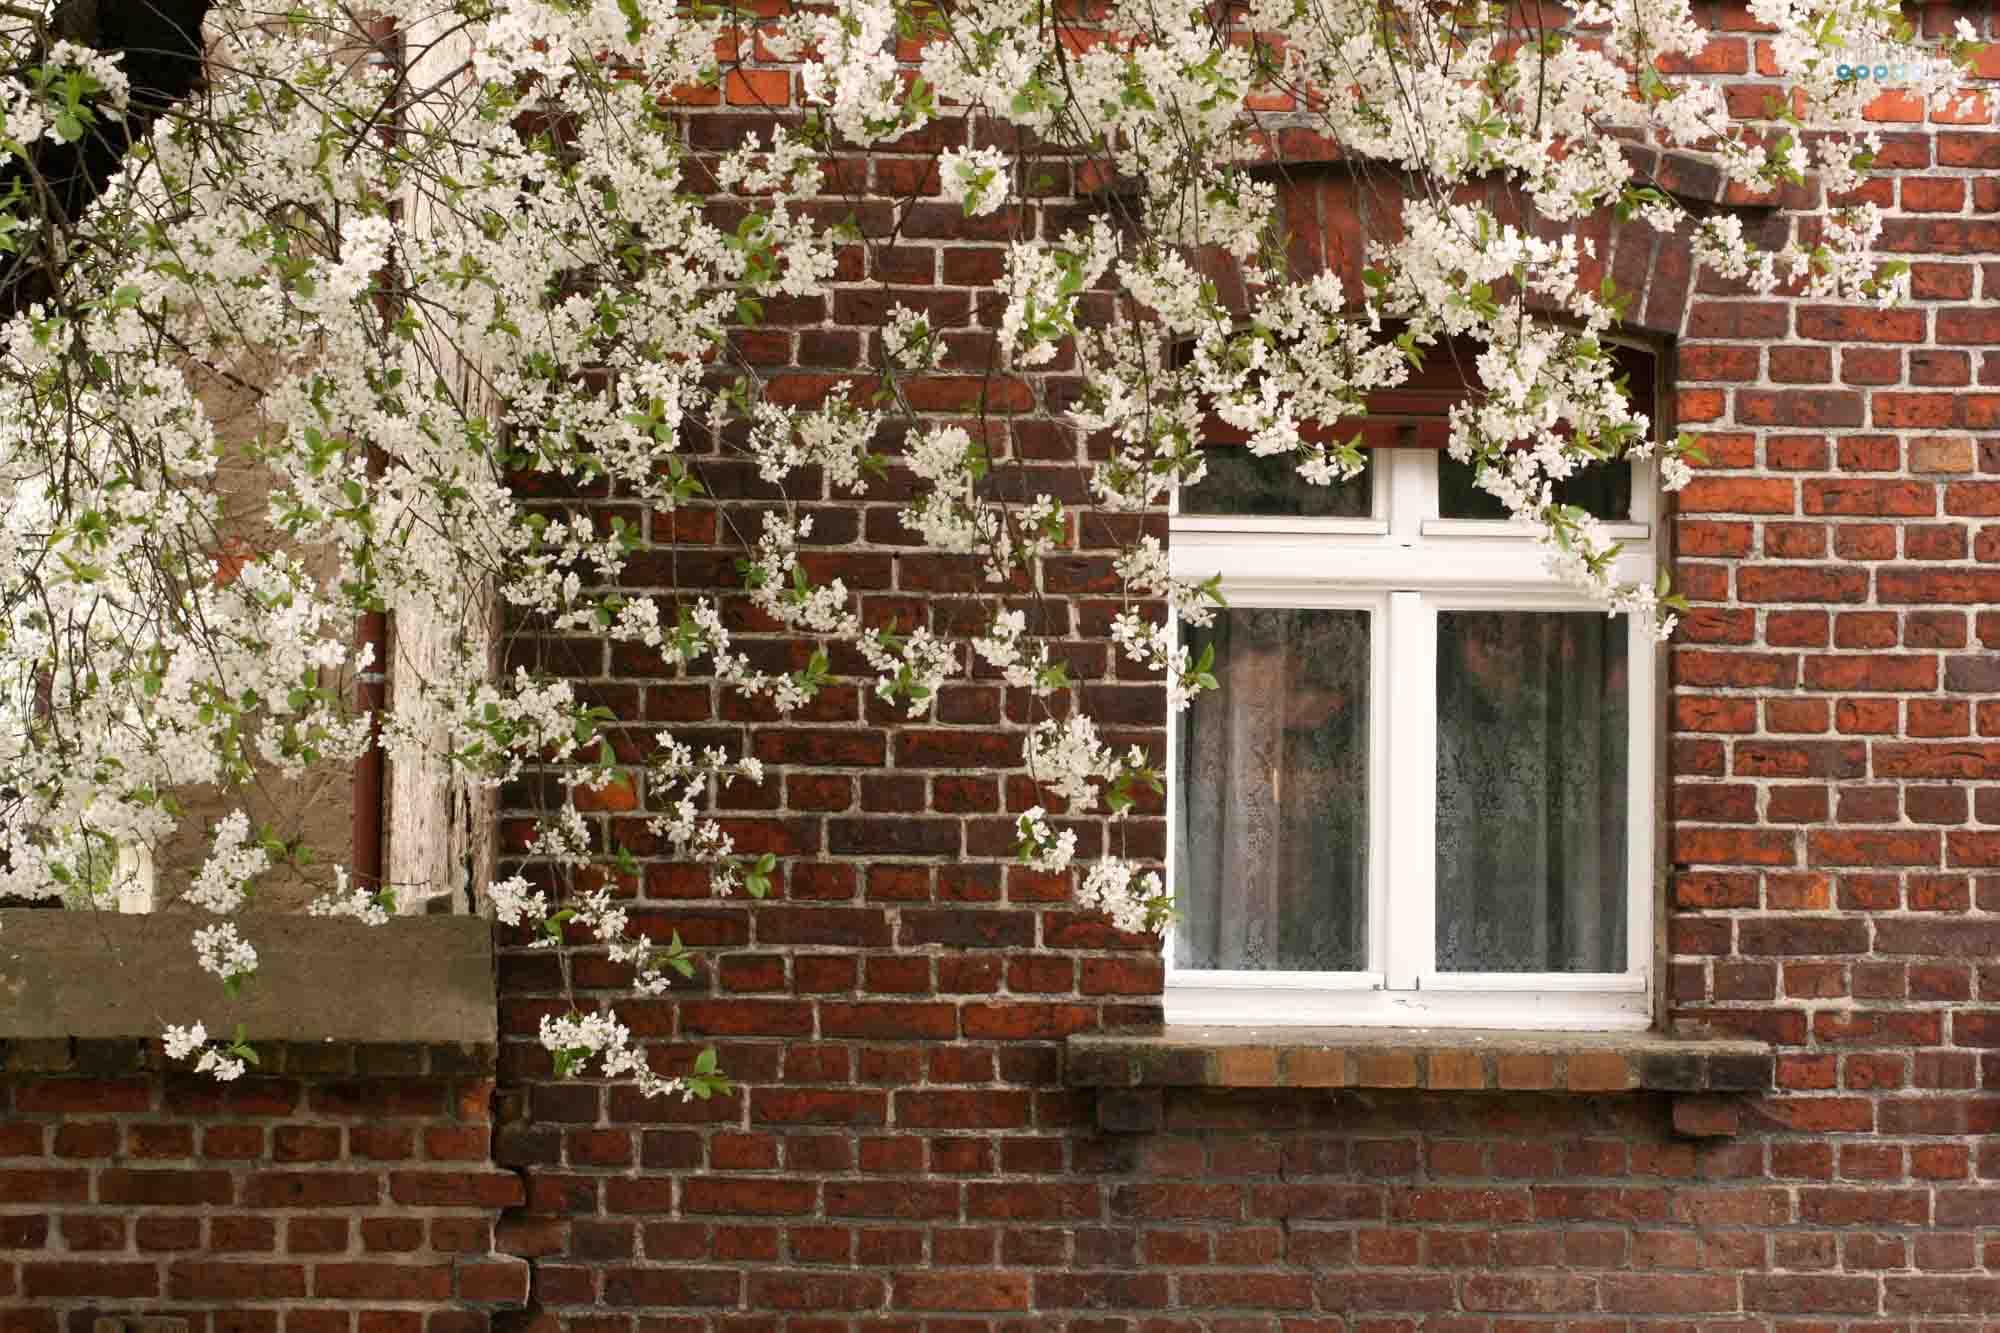 craftaliciousme seeking creative life 20 ideas when staying home